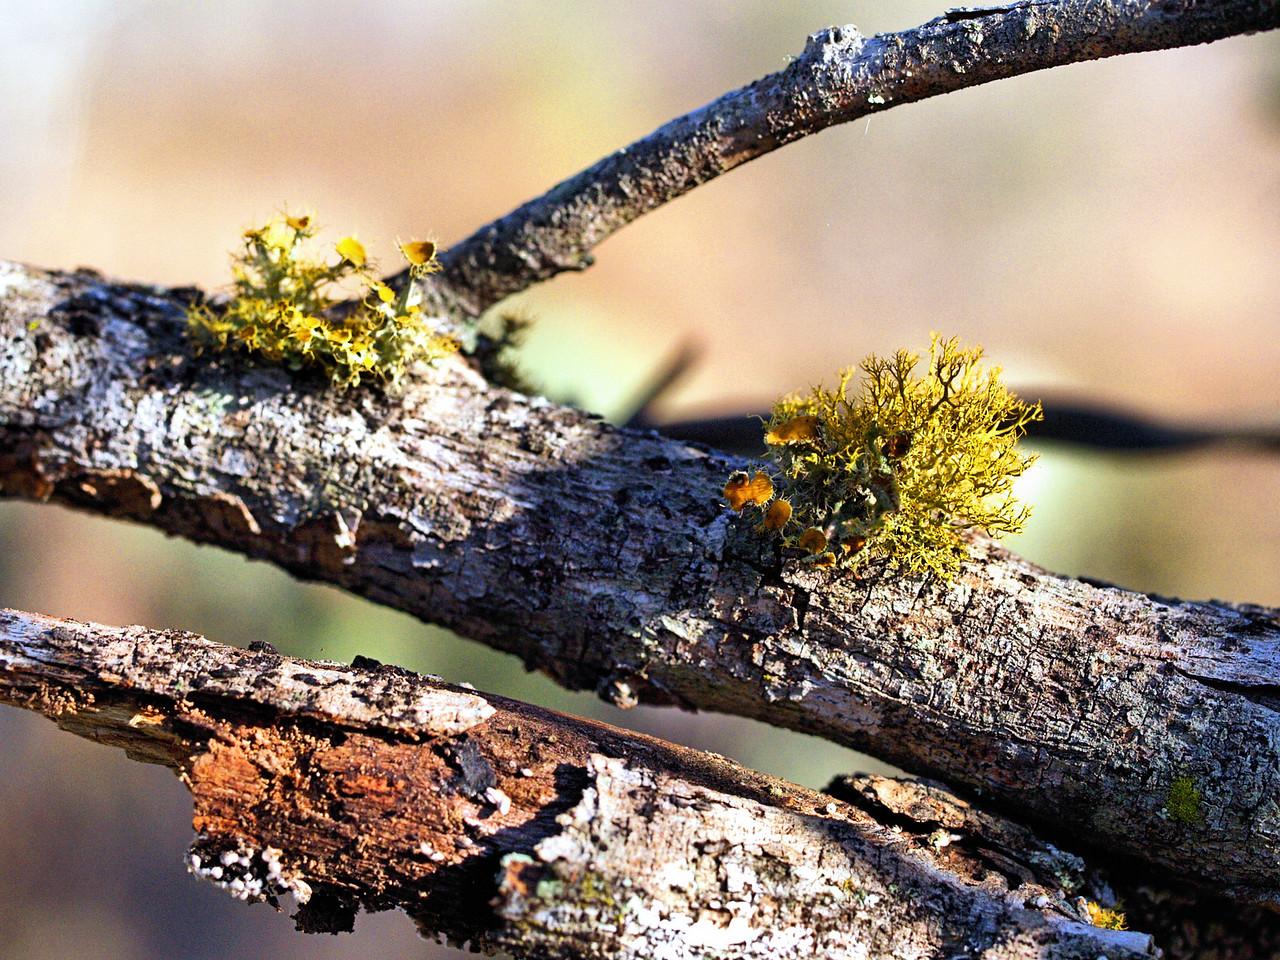 OLYMPUS DIGITAL CAMERA--Lichen growths on a mesquite branch.